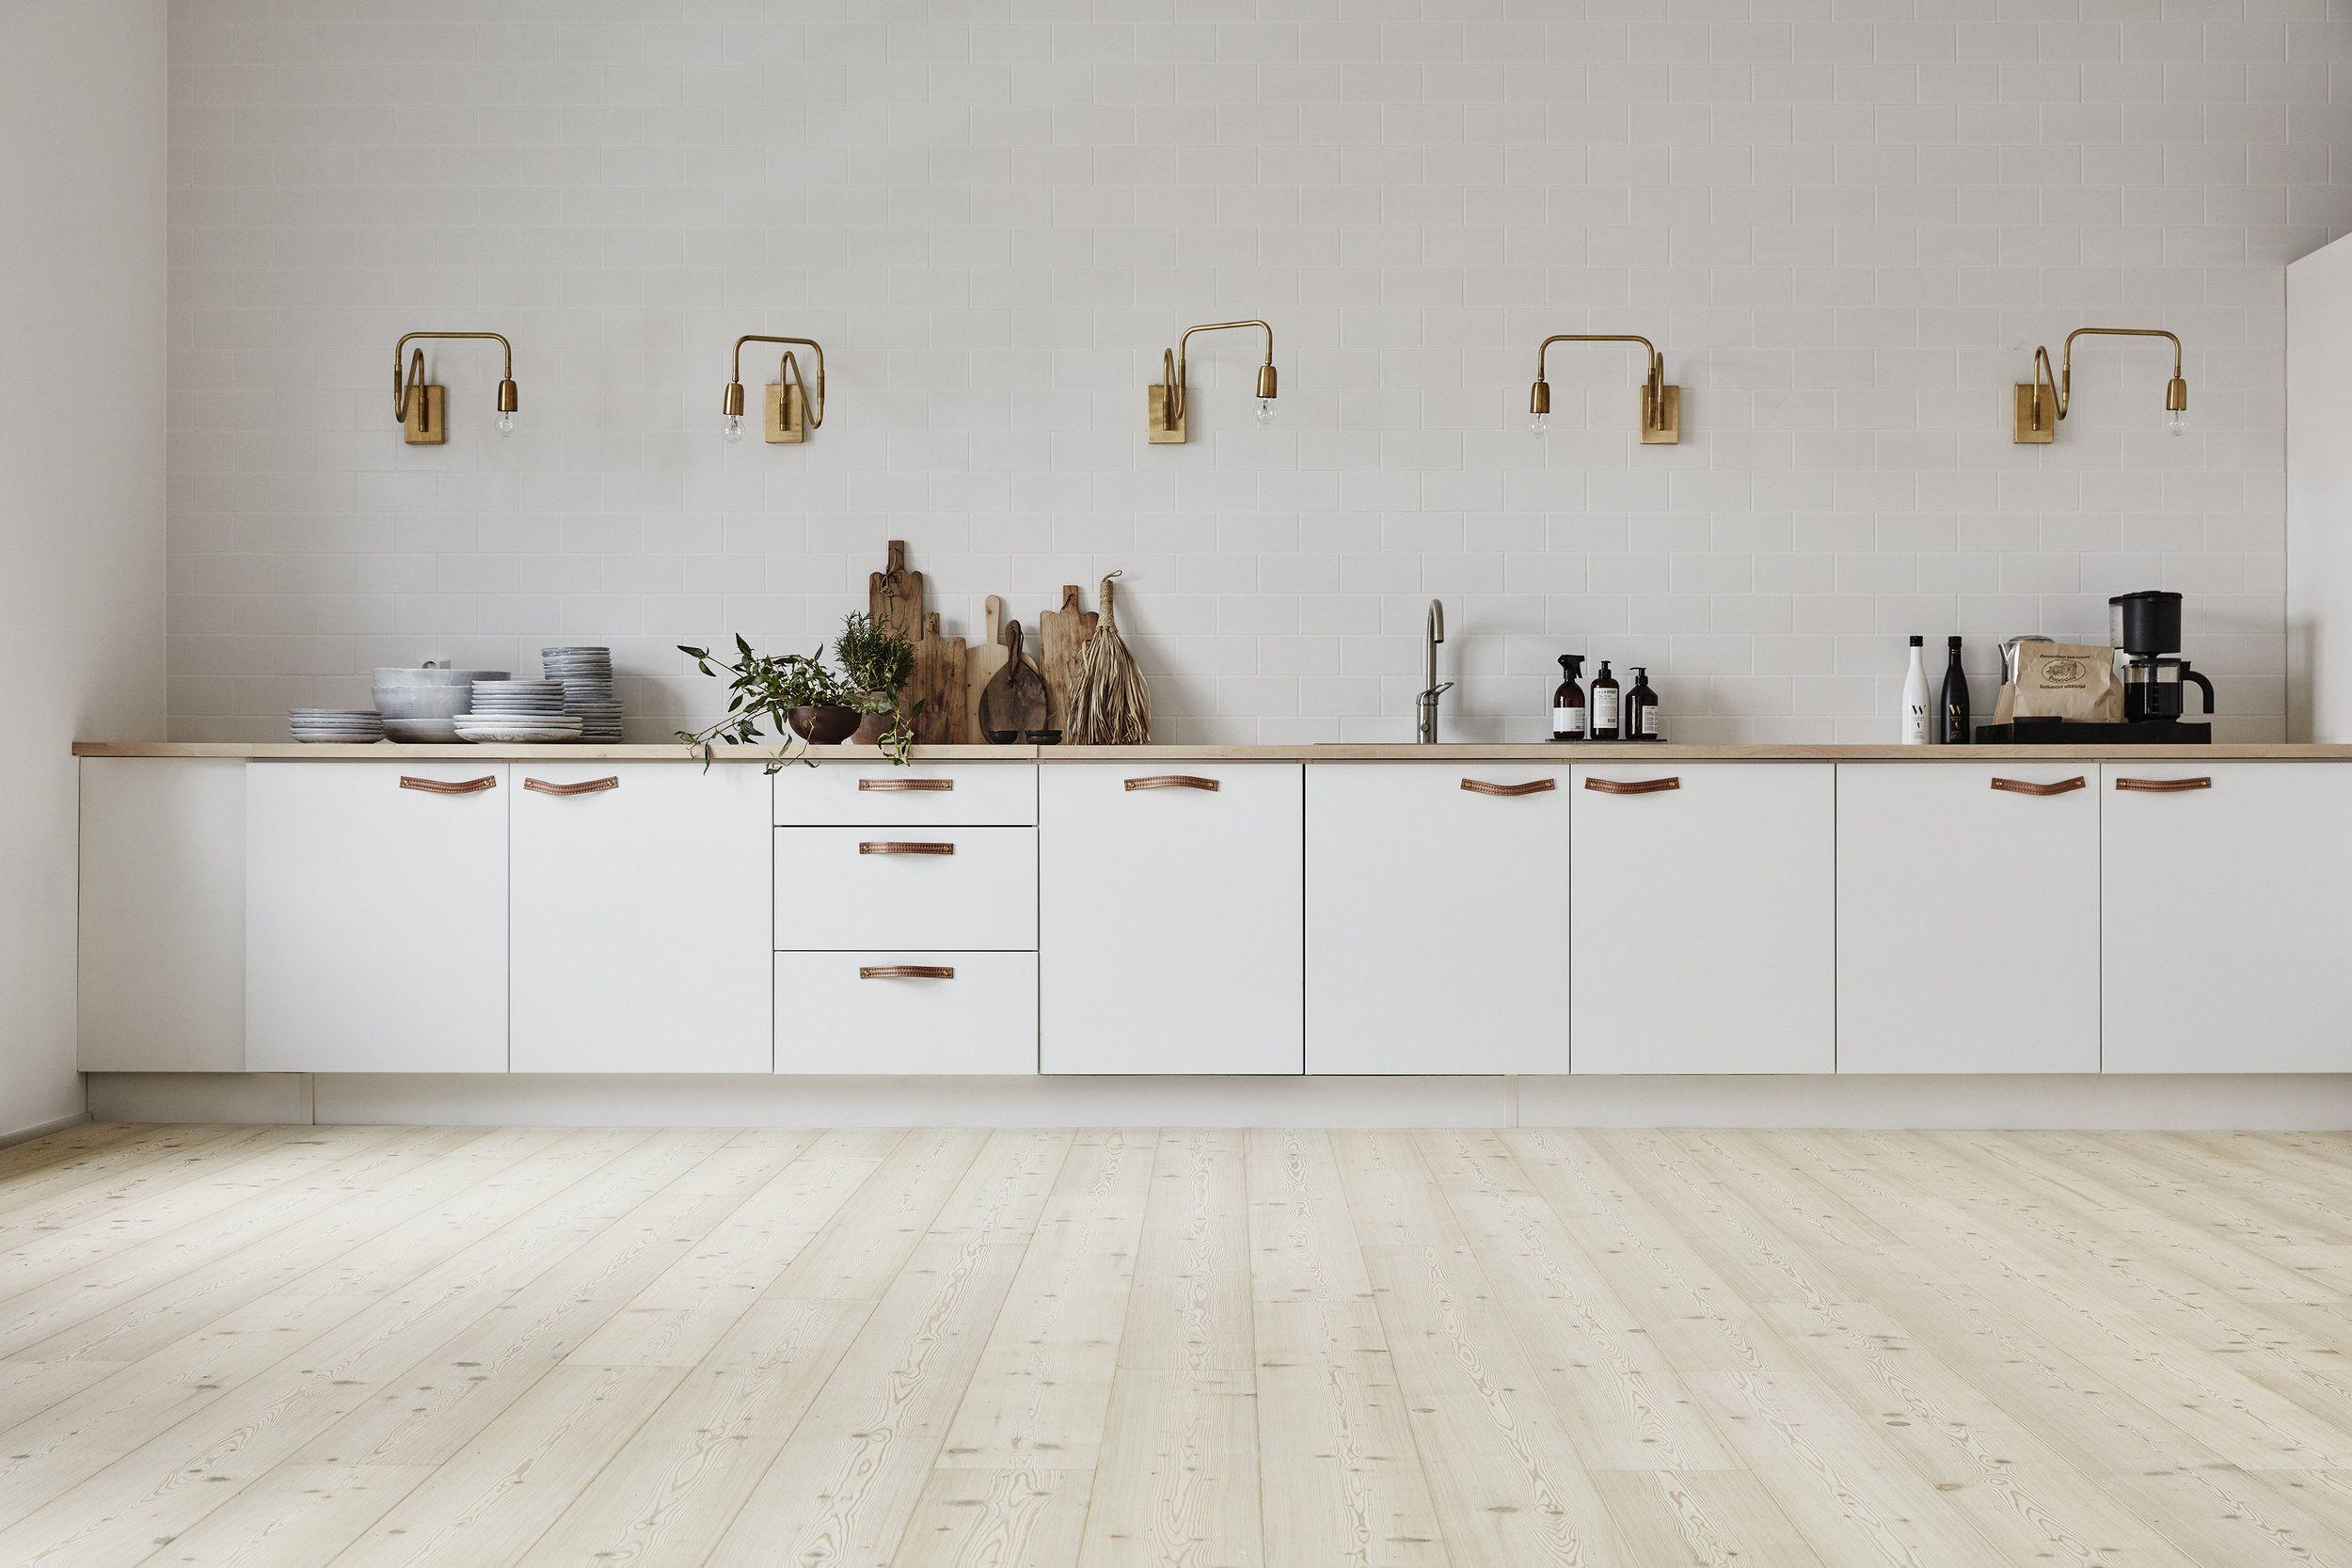 Berühmt Diy Kücheninseln Mit Sitz Ideen - Küchenschrank Ideen ...